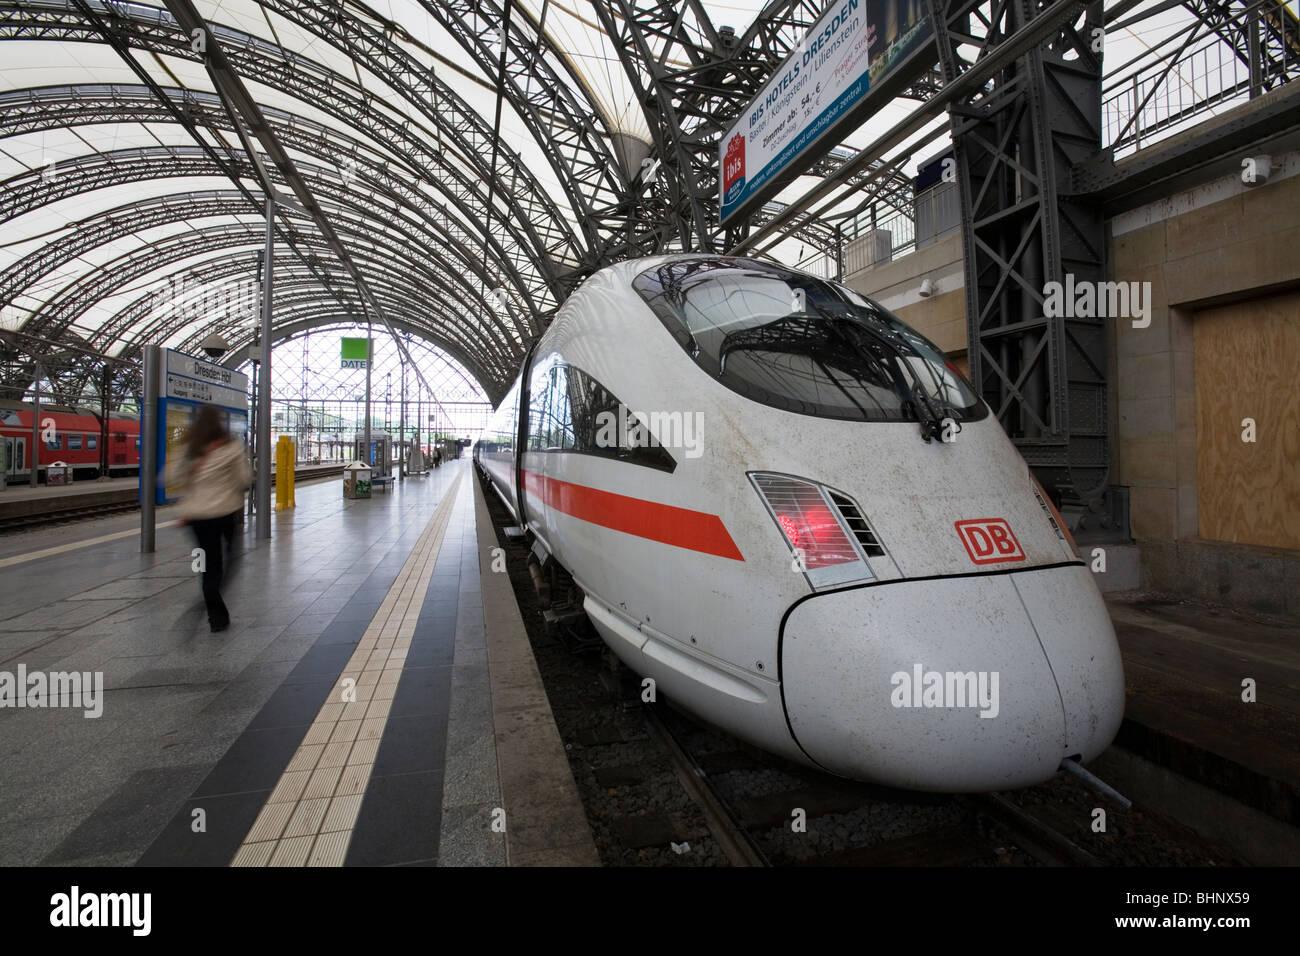 ICE train ready to depart in Hauptsächlich Bahnhof Dresden, Germany - Stock Image